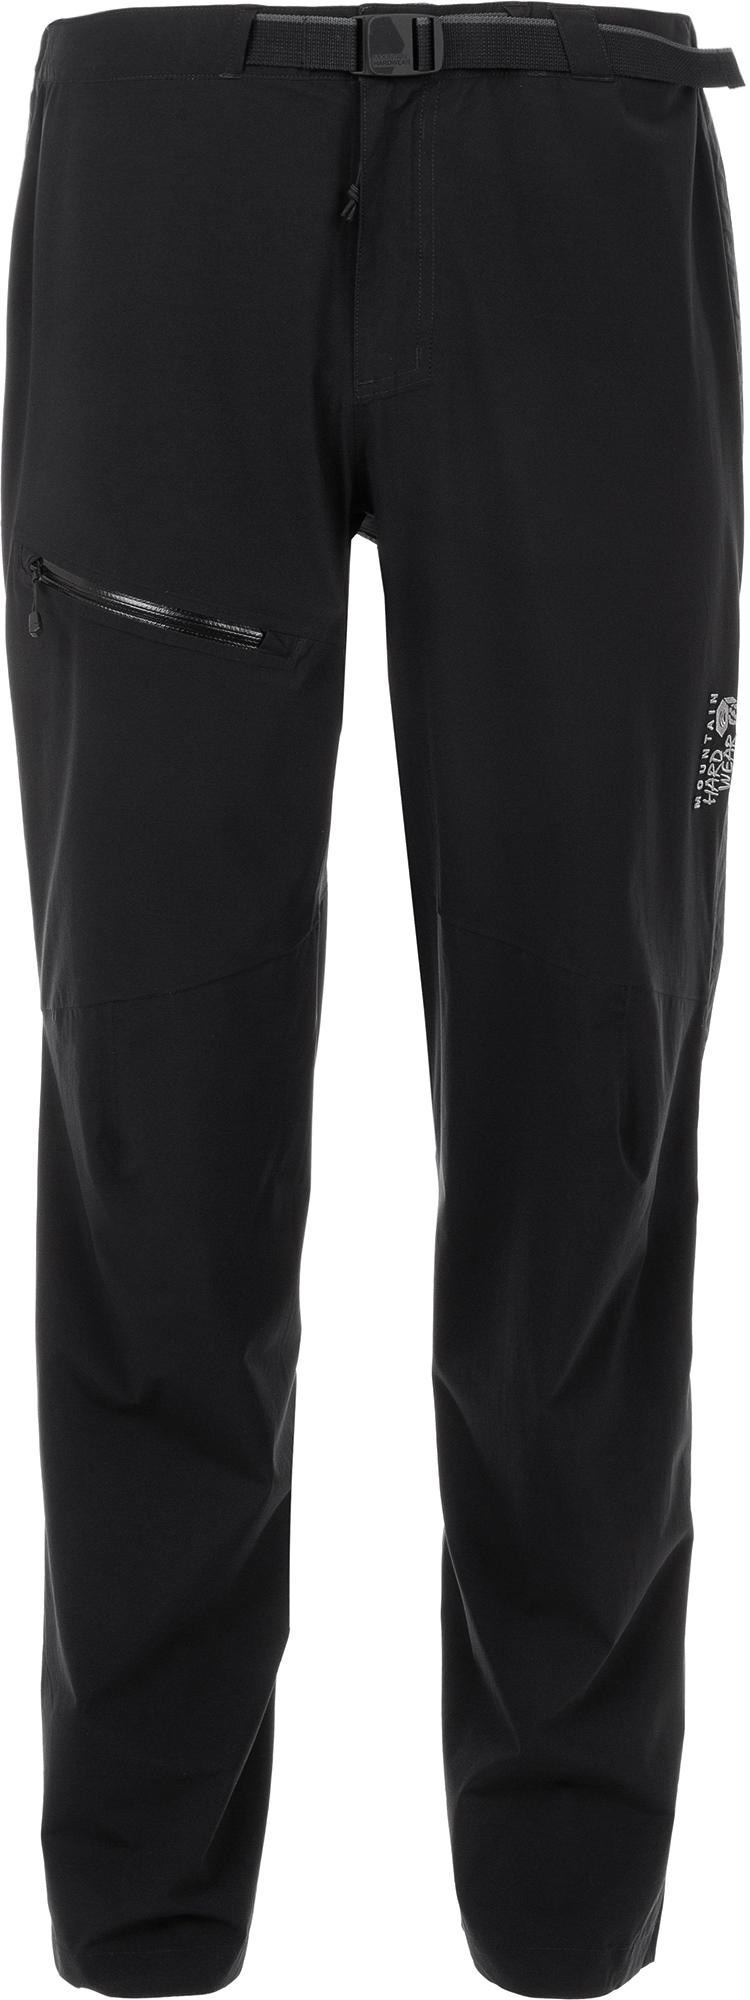 Брюки мужские Mountain Hardwear Stretch Ozonic, размер 54 mountain hardwear брюки мужские mountain hardwear exposure 2™ gore tex paclite® stretch размер 48